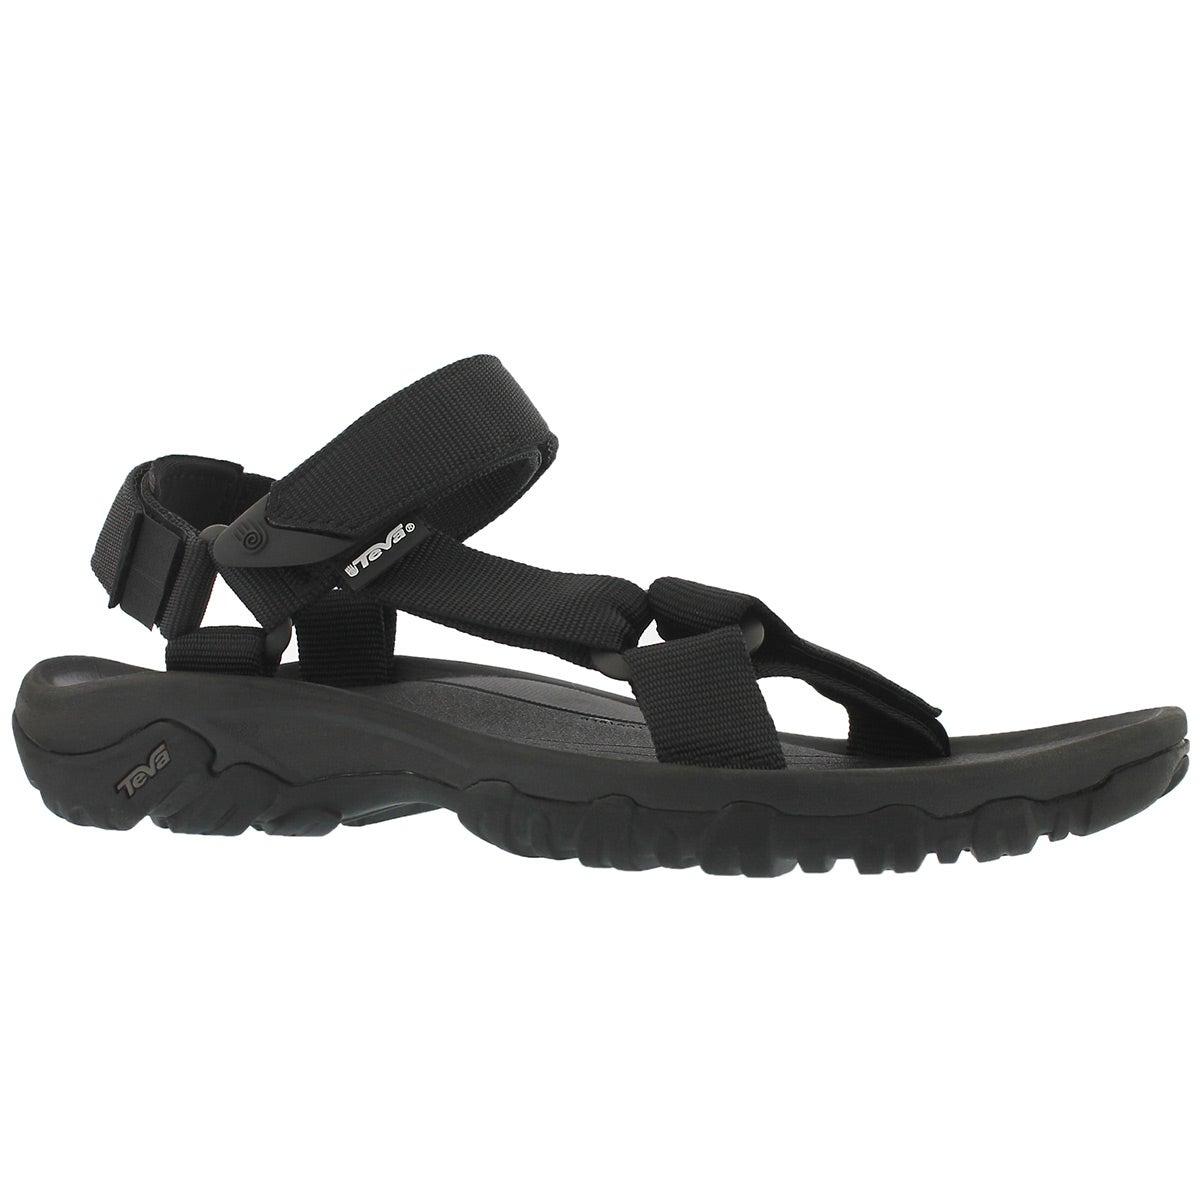 Men's HURRICANT XLT black sport sandals